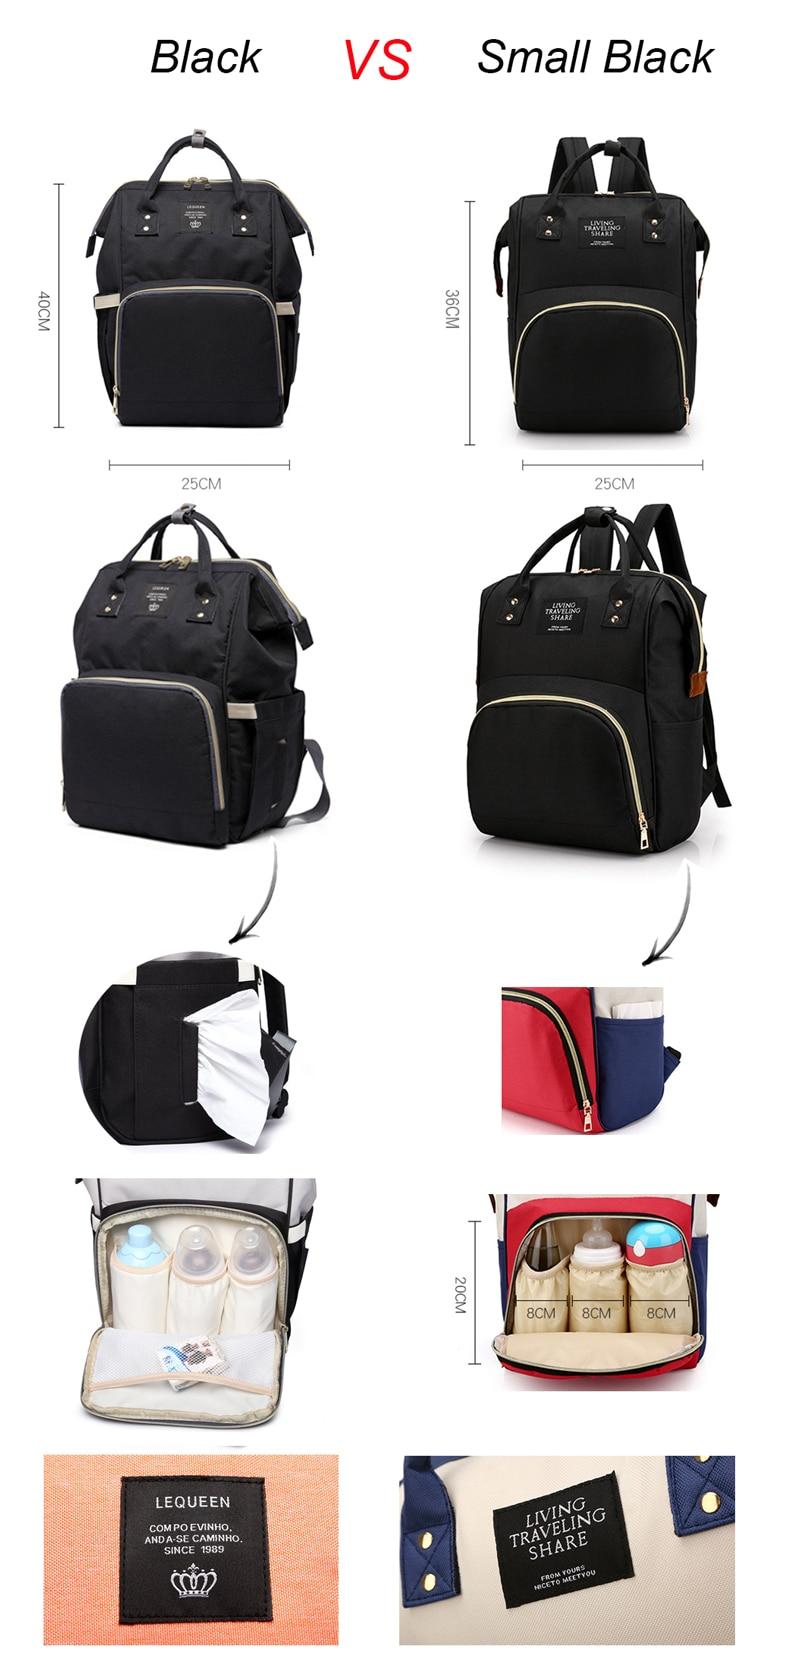 HTB1yRjgcBOD3KVjSZFFq6An9pXac Lequeen Fashion Mummy Maternity Nappy Bag Large Capacity Nappy Bag Travel Backpack Nursing Bag for Baby Care Women's Fashion Bag